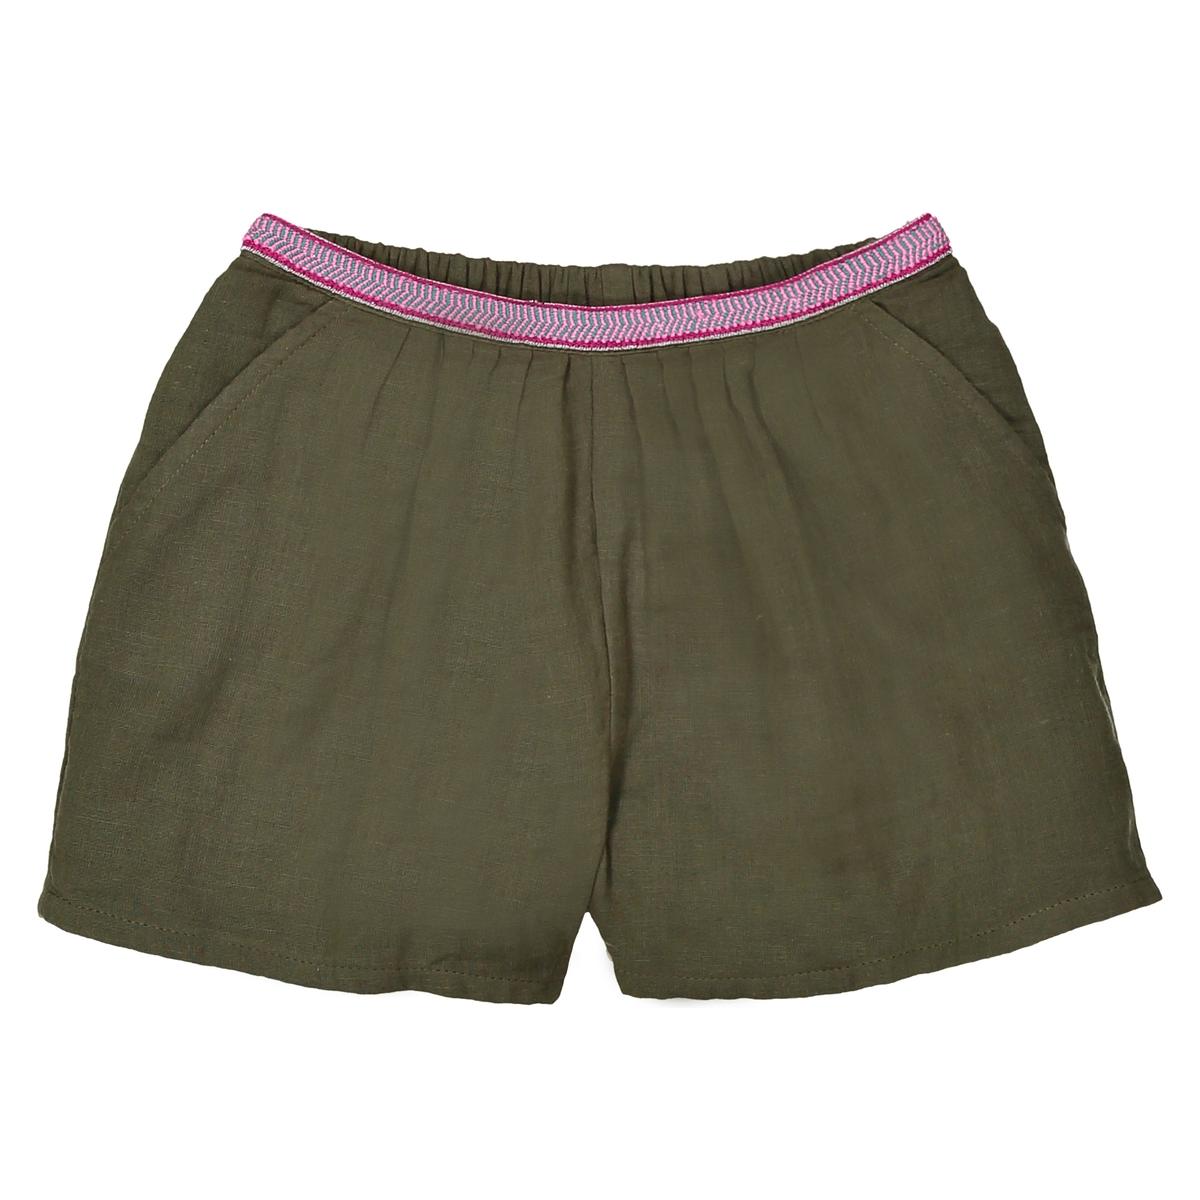 Shorts cintura fantasia in garza di cotone da 3 a 12 anni